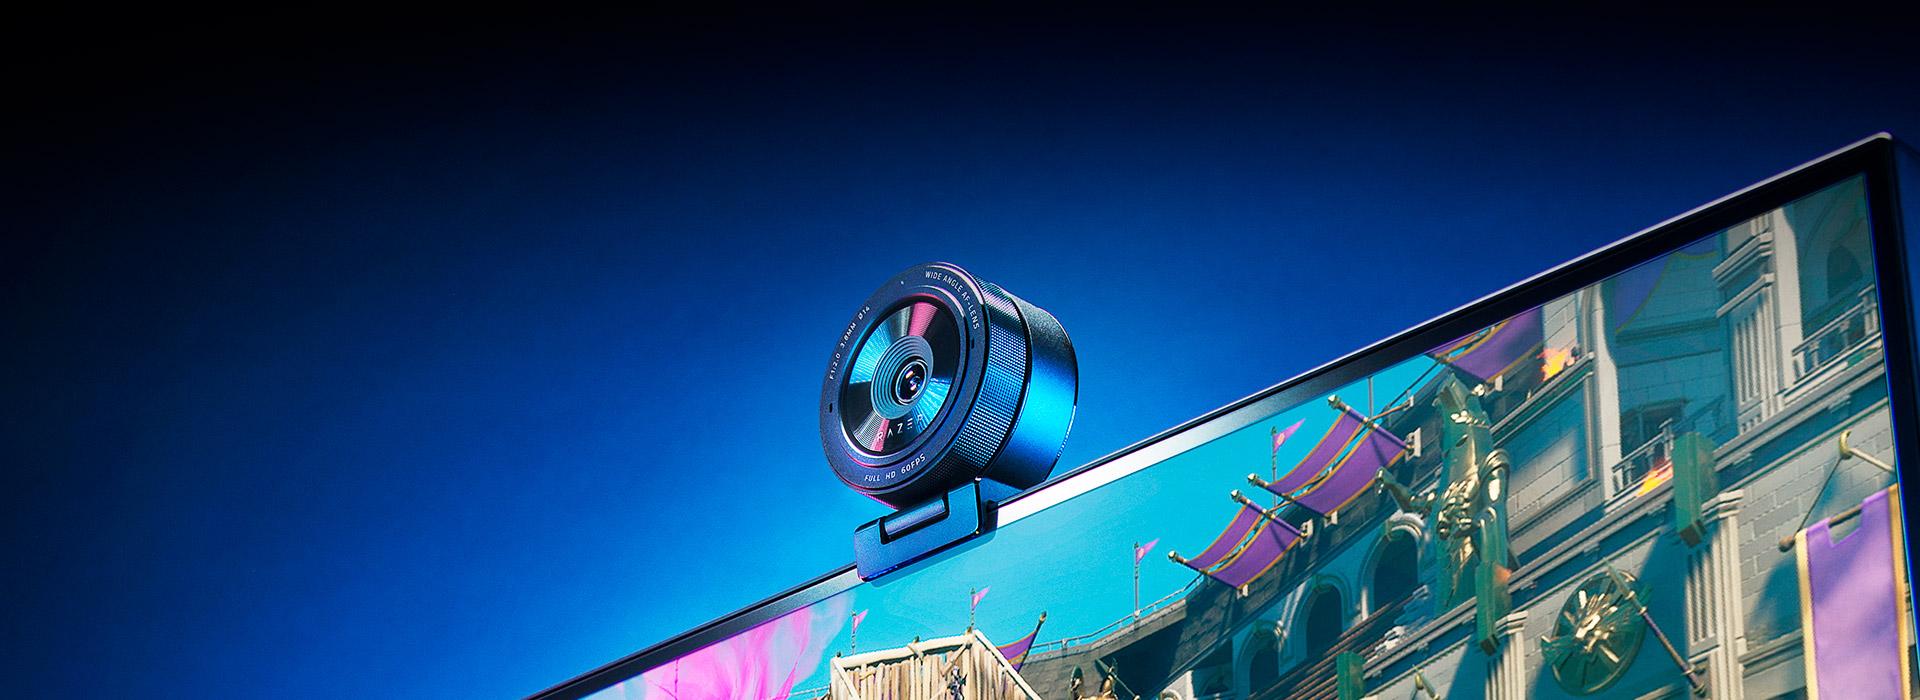 Веб-камера Razer Kiyo Pro